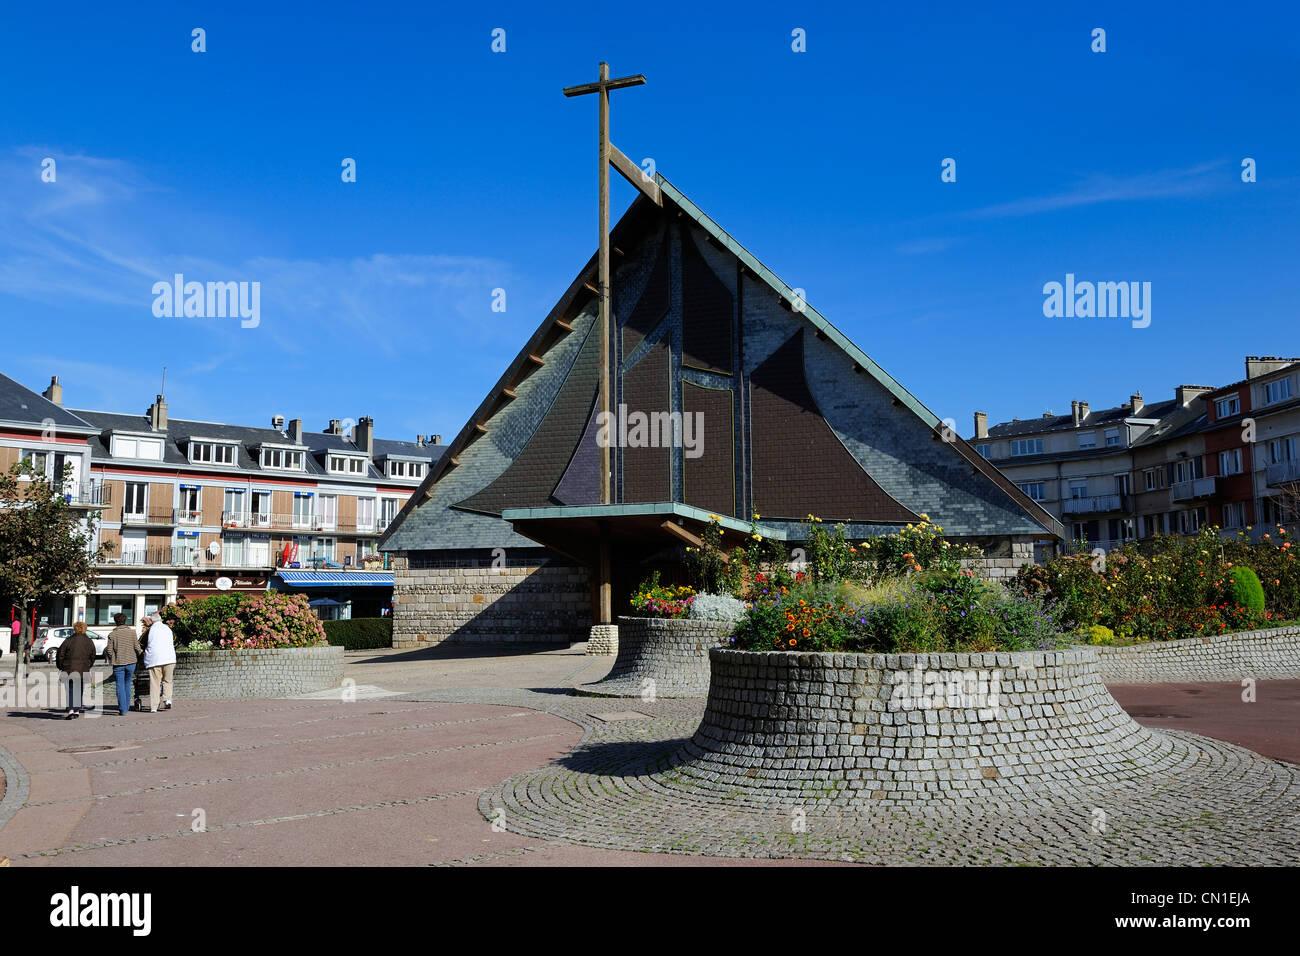 France, Seine Maritime, Saint Valery en Caux, the church - Stock Image